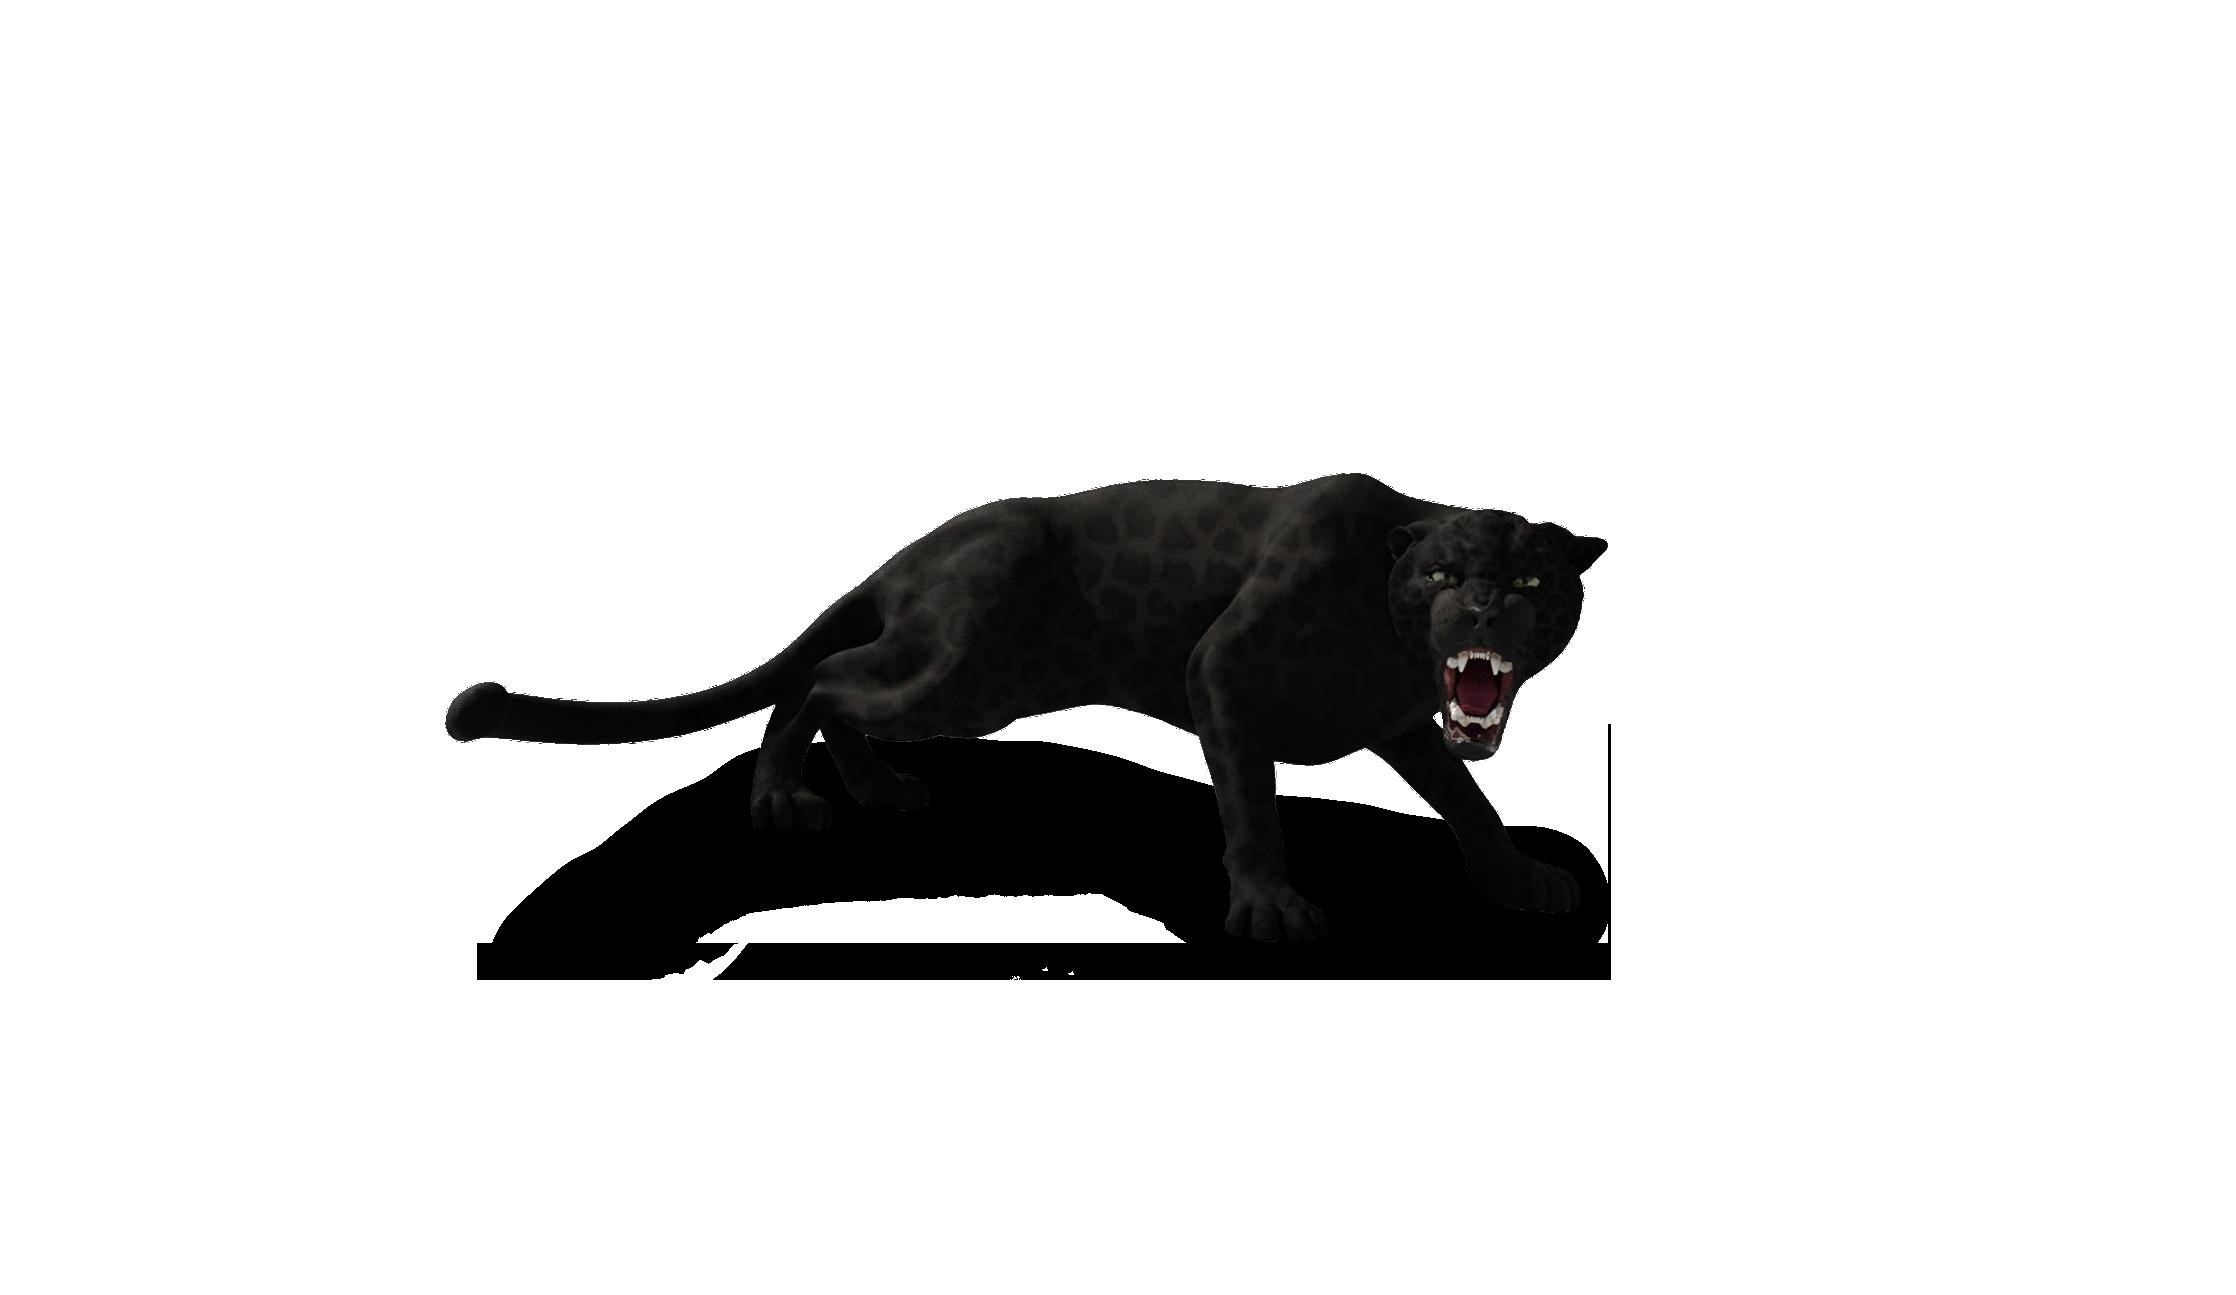 jaguar_render_001TRANSPARENT.png